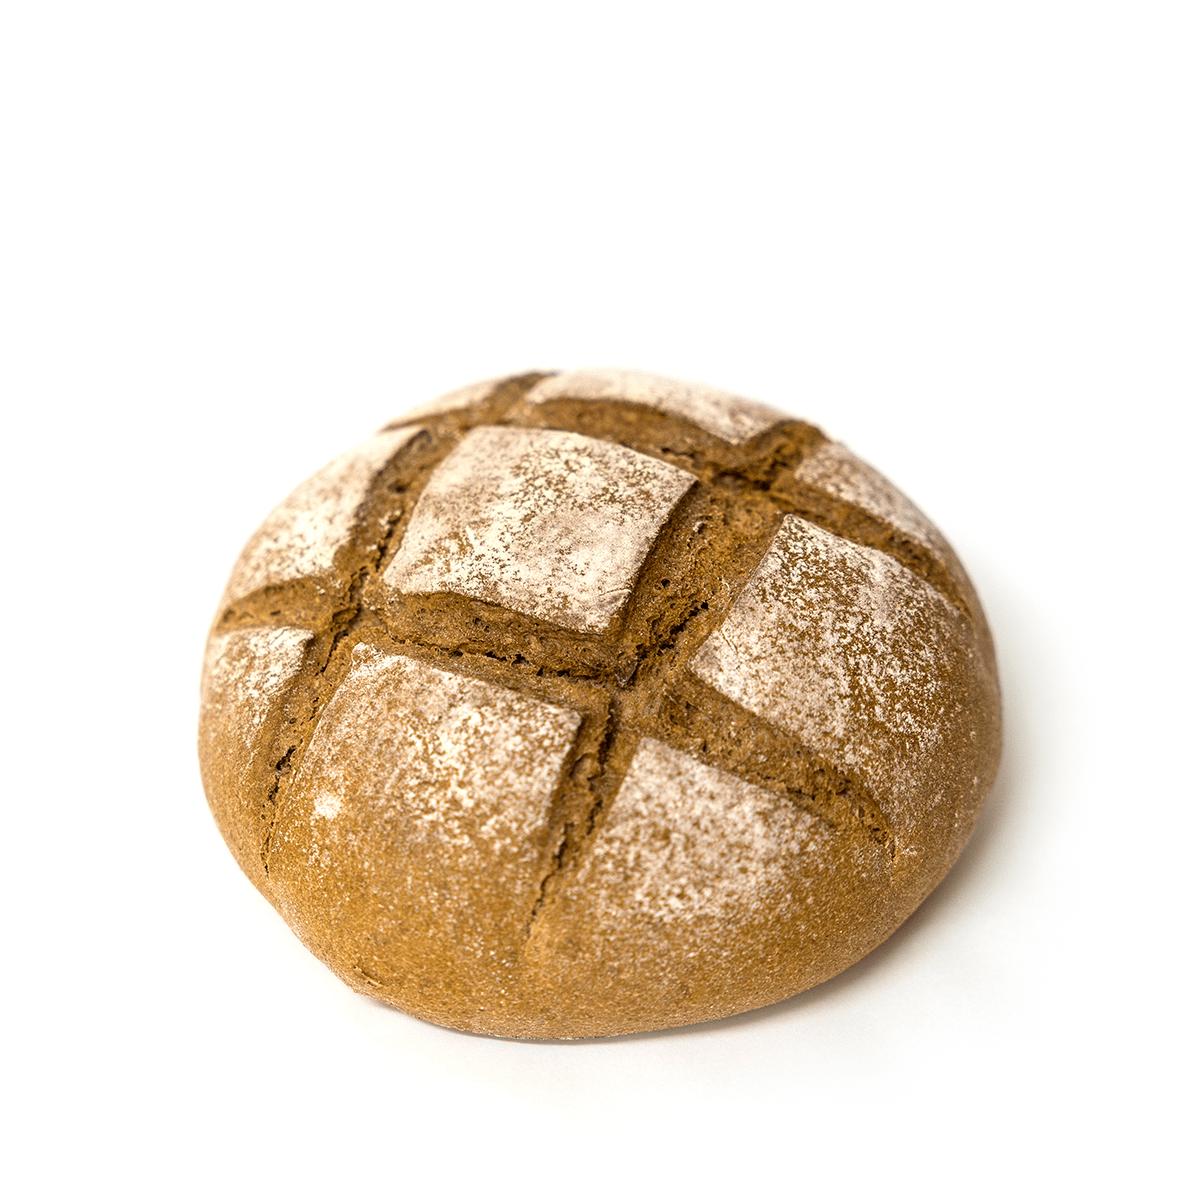 pao-centeio-padaria-pastelaria-entrega-casa-cale-confeitaria-tradicional-portuguesa-peniche-caldas-rainha-padaria-pastelaria